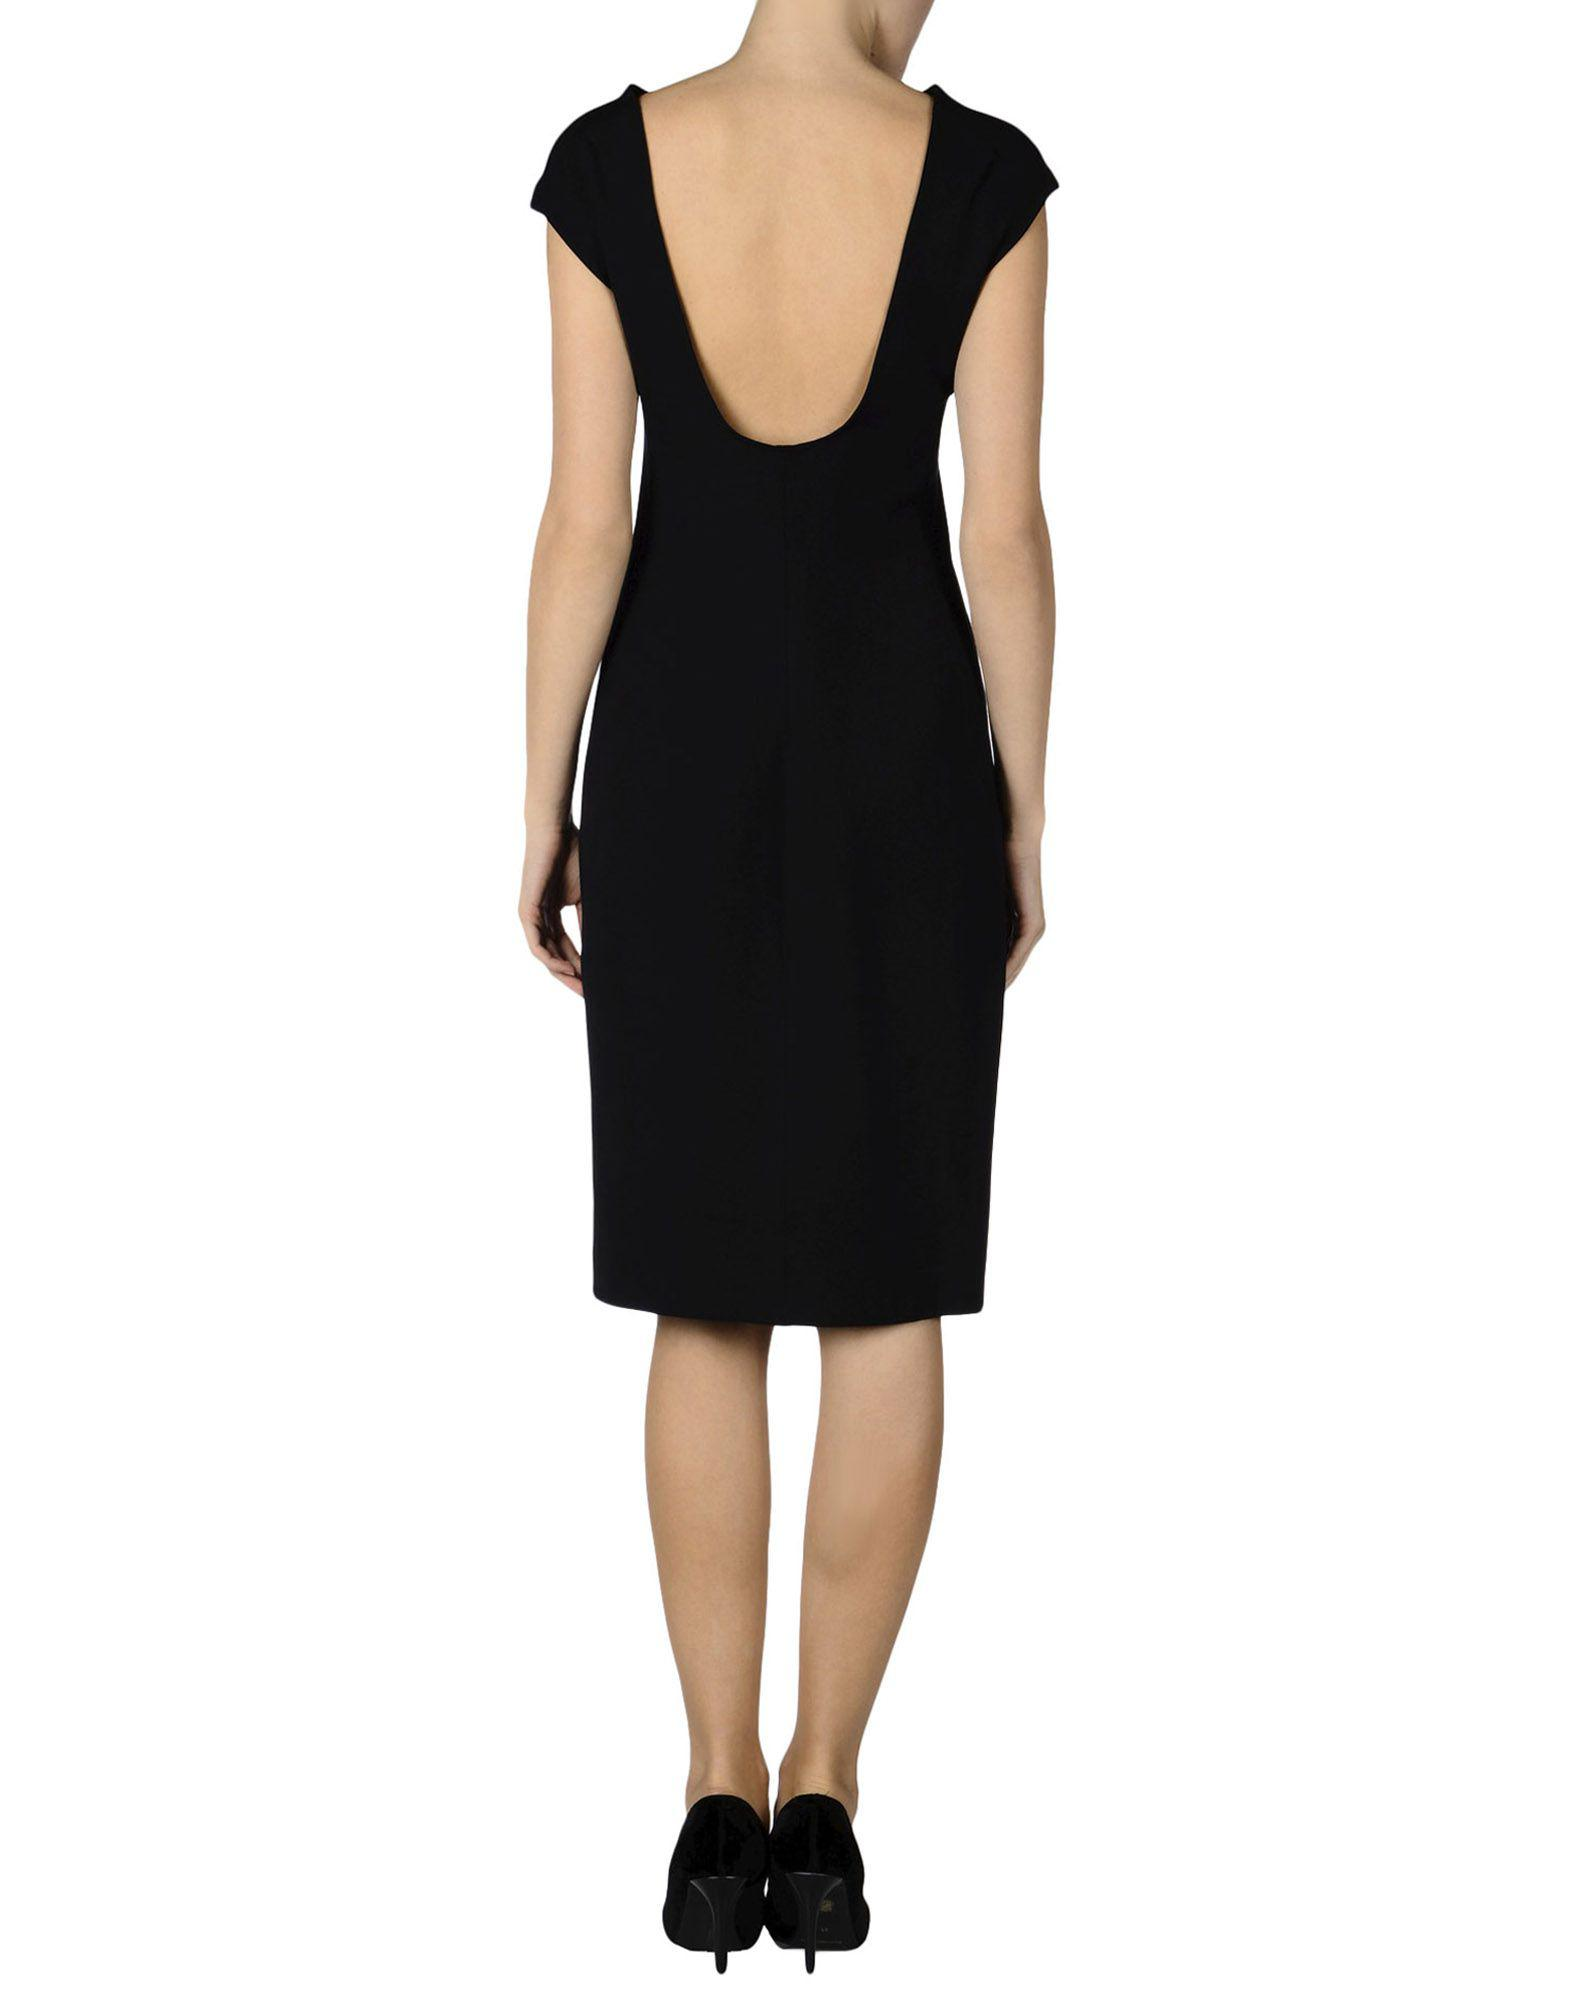 Knee Lyst Dress The Row Length Black In 0Ew4OE8q